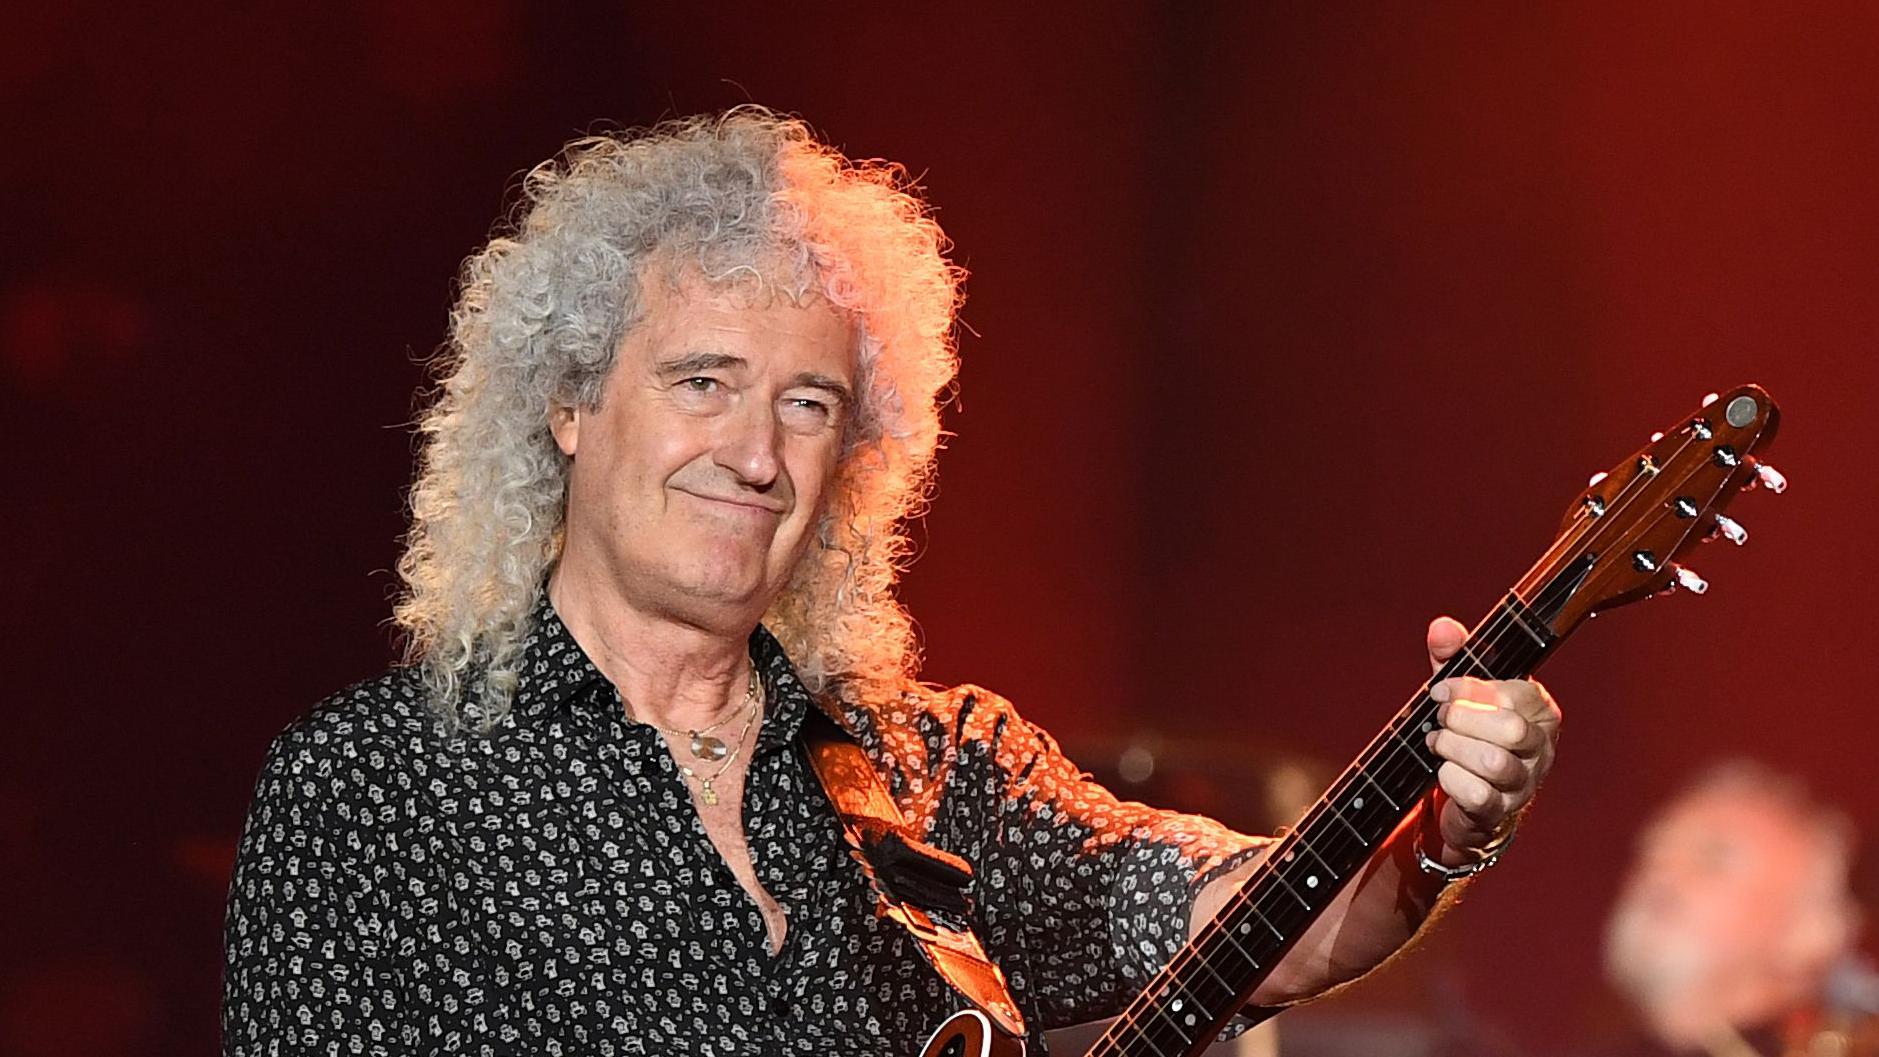 Guitarrista de Queen, Brian May, fue hospitalizado